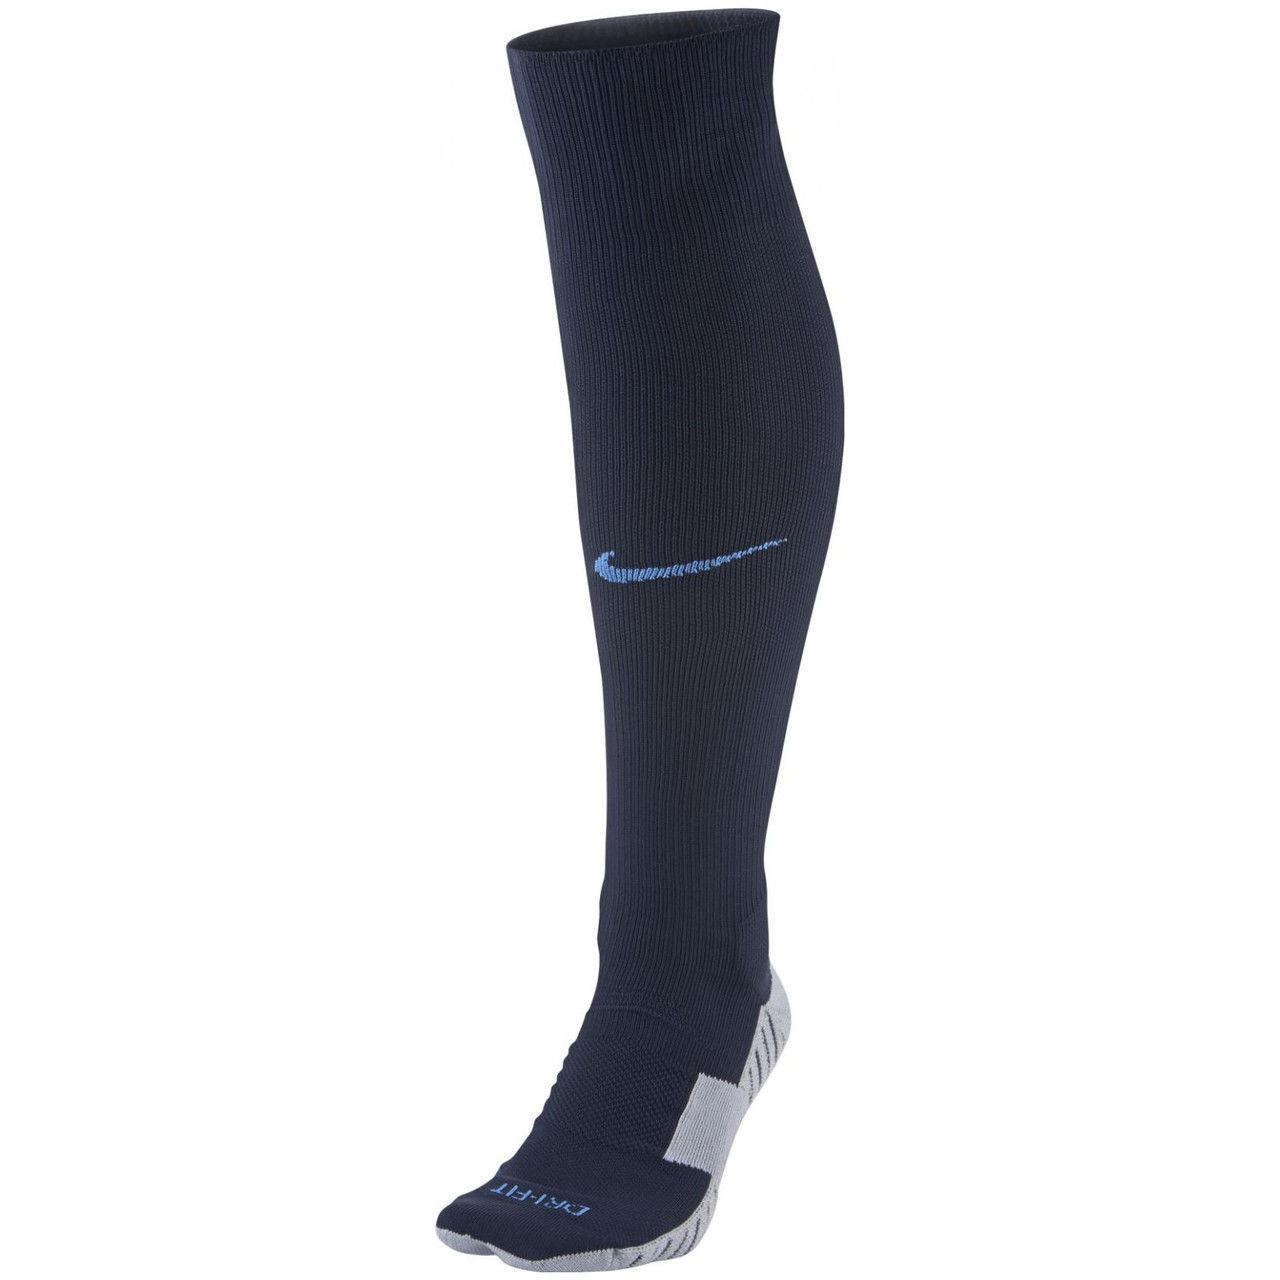 Футбольные гетры Nike  Stadium Soccer Otc Socks